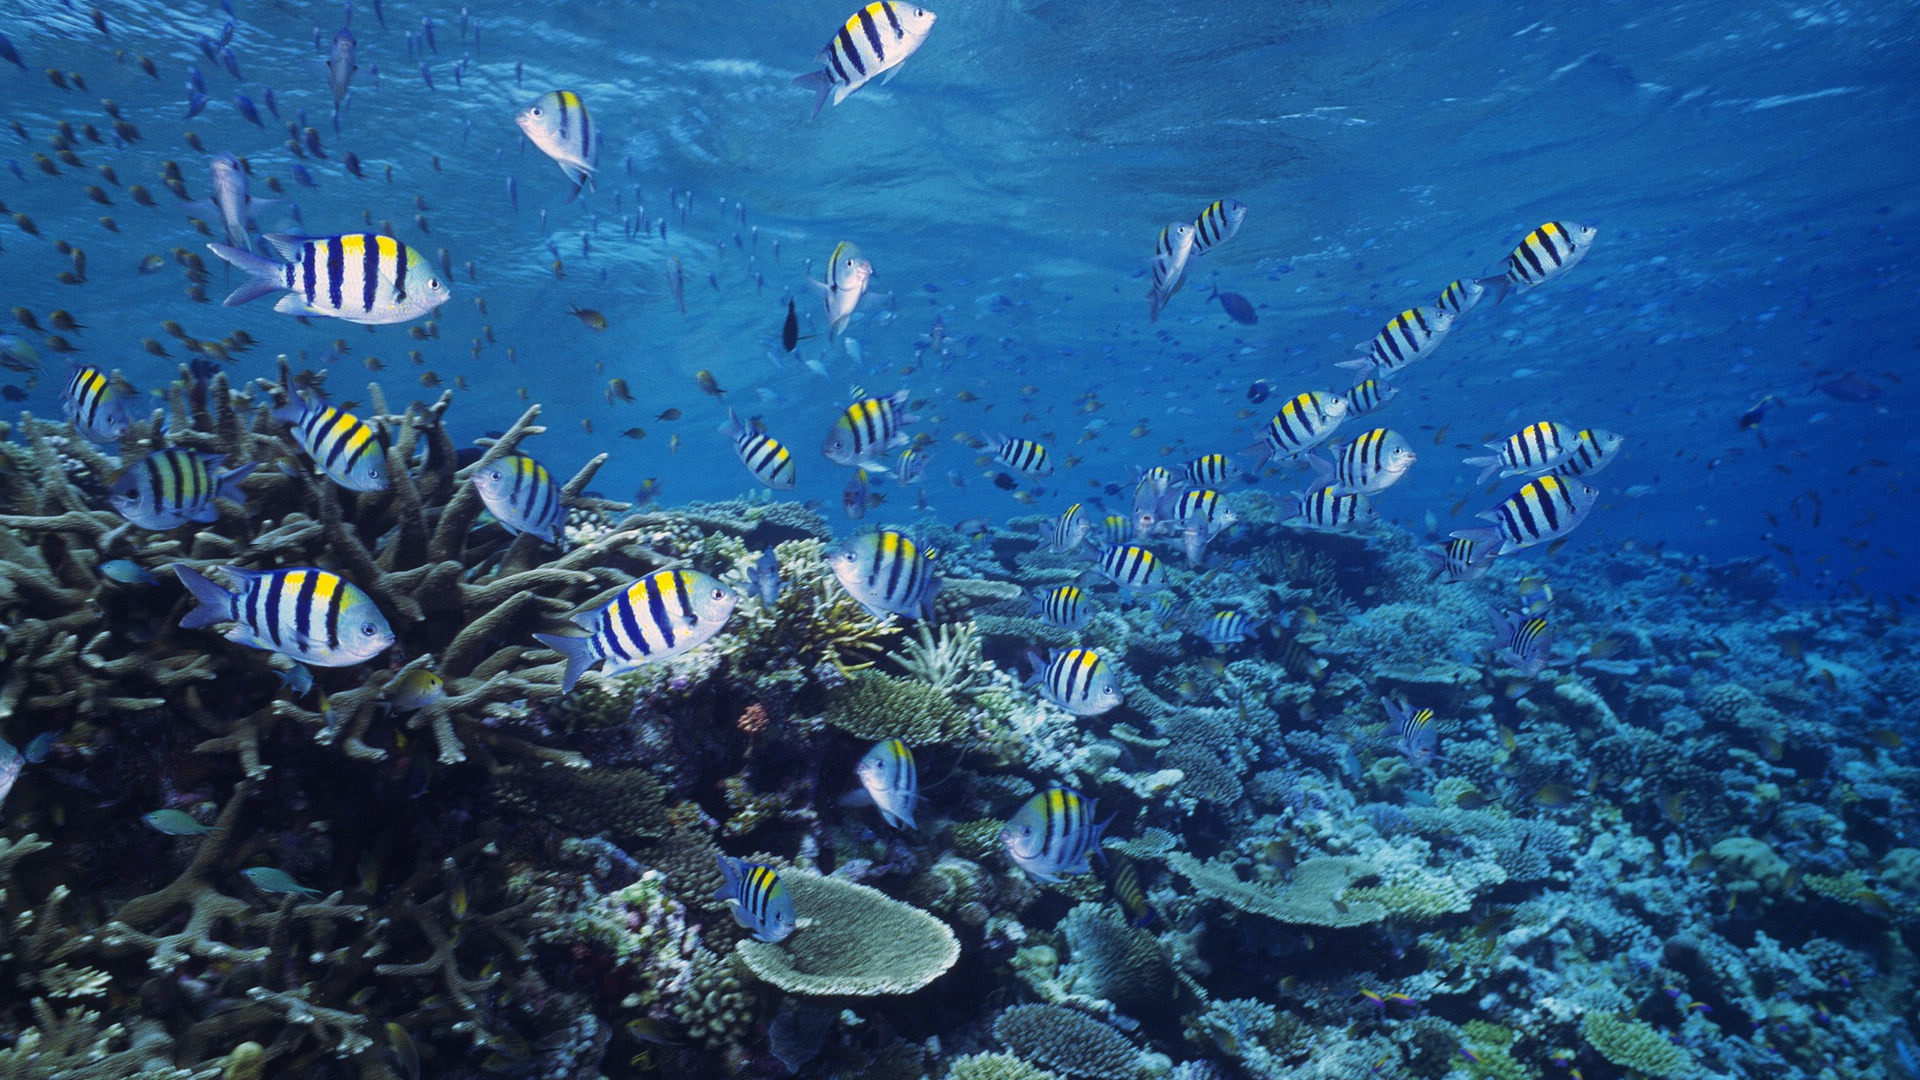 Ocean Sea Life Wallpaper for Tablet PC